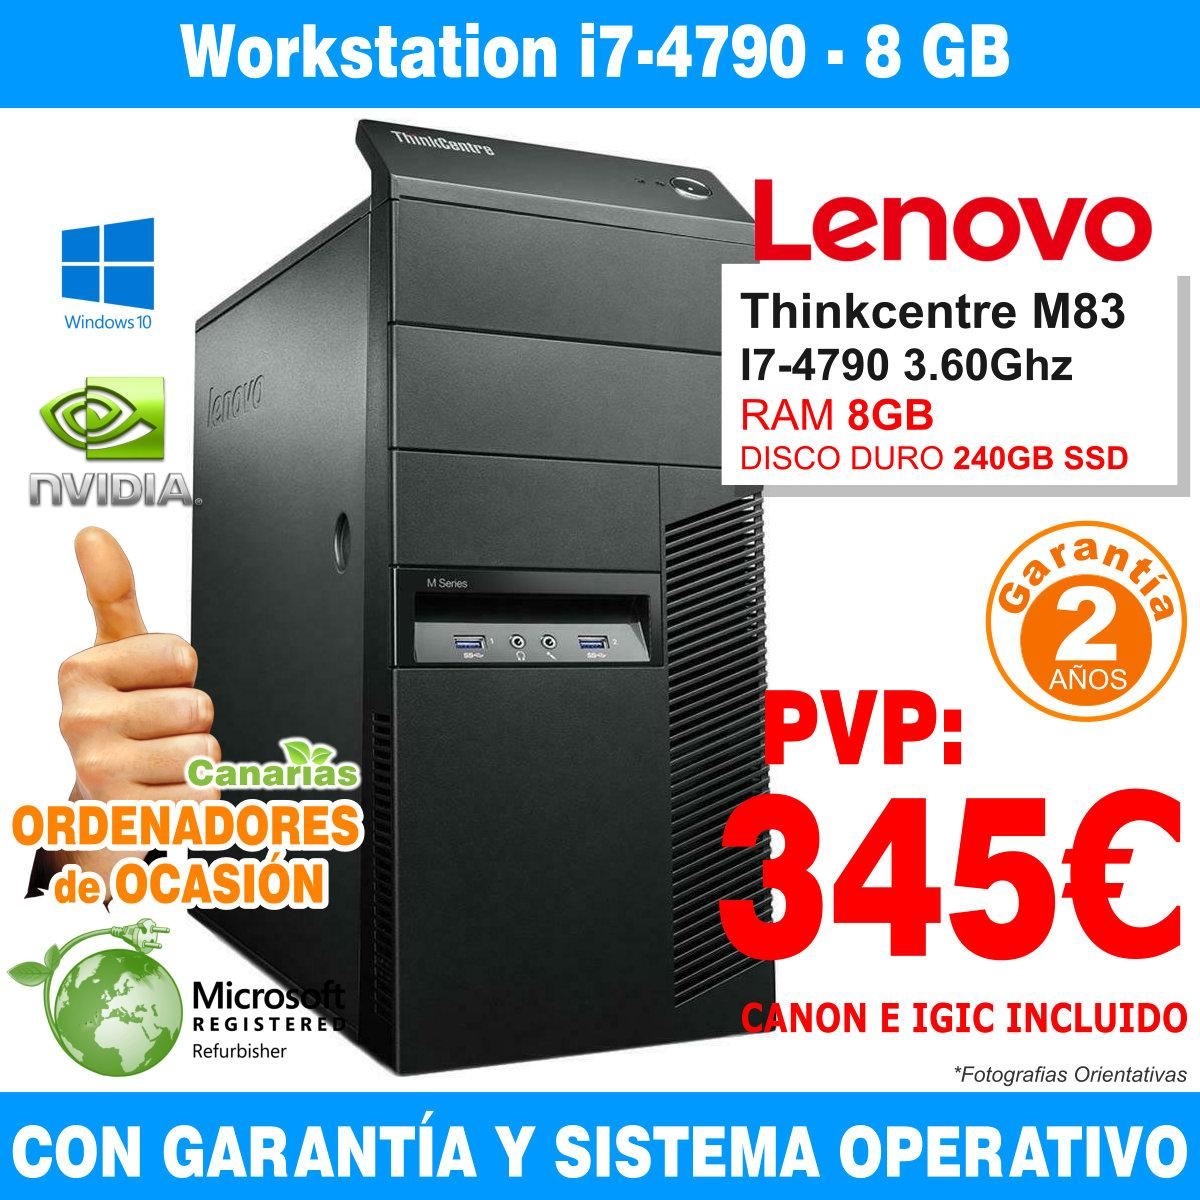 Intel Core I7-4790 3.30GHz - 8GB - 240GB SSD  - LENOVO THINKCENTRE M83 MT